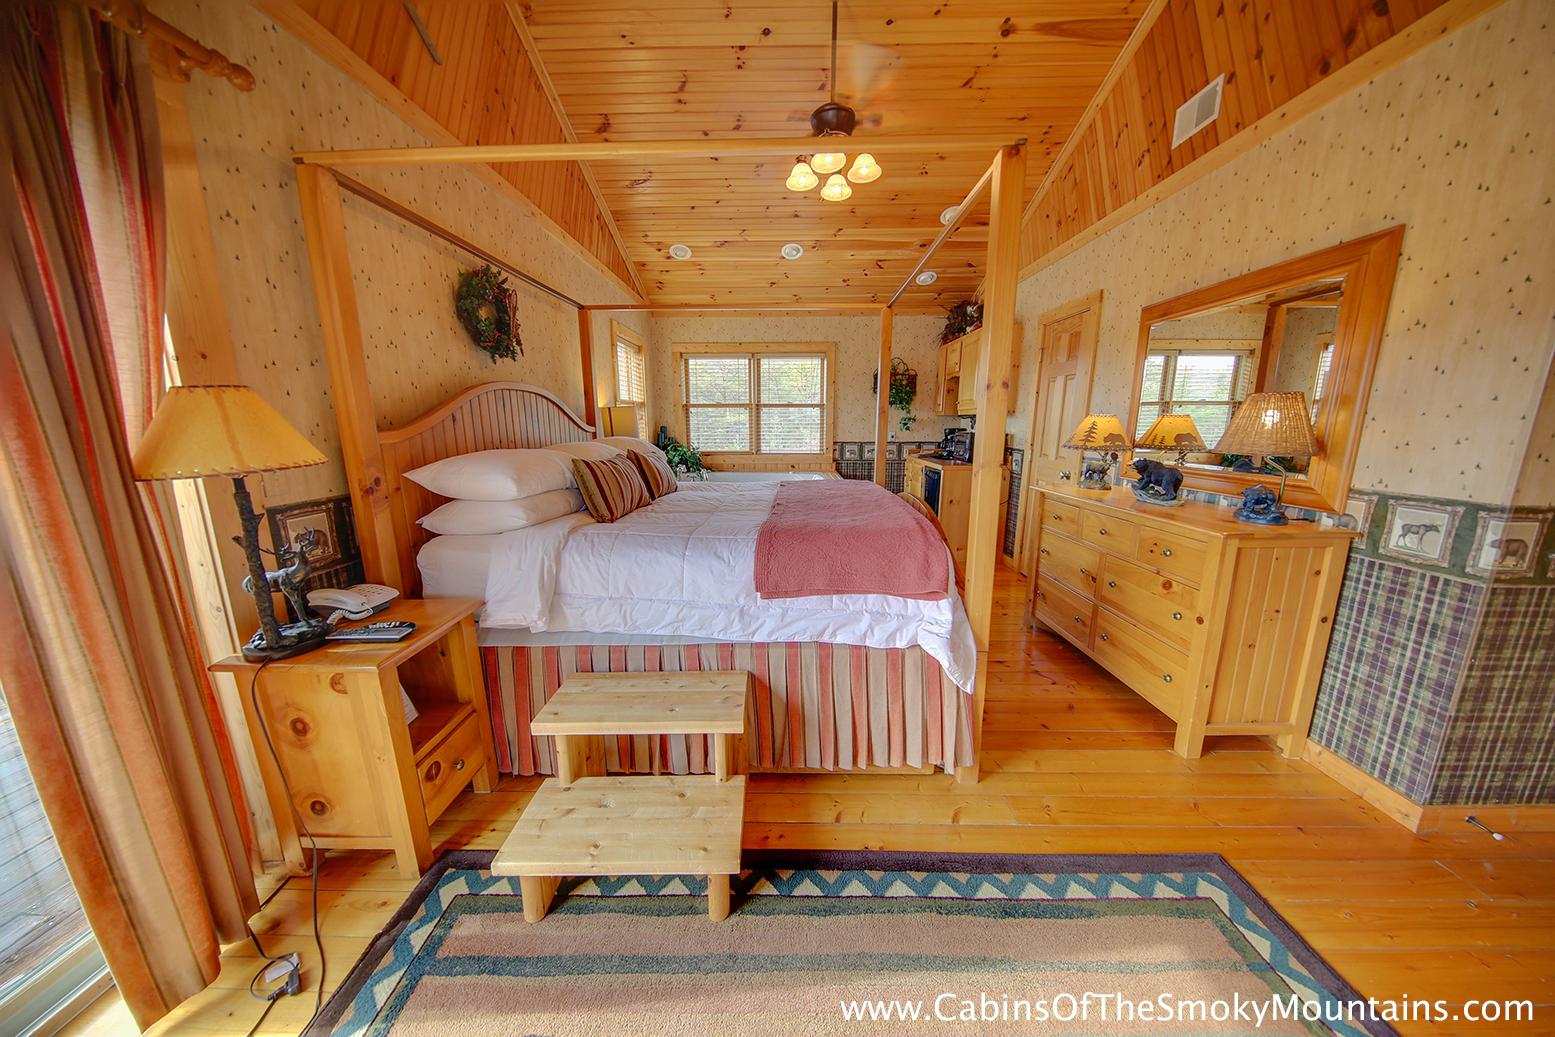 Pigeon forge cabin fox n socks 3 bedroom sleeps 10 for 3 bedroom cabins in smoky mountains